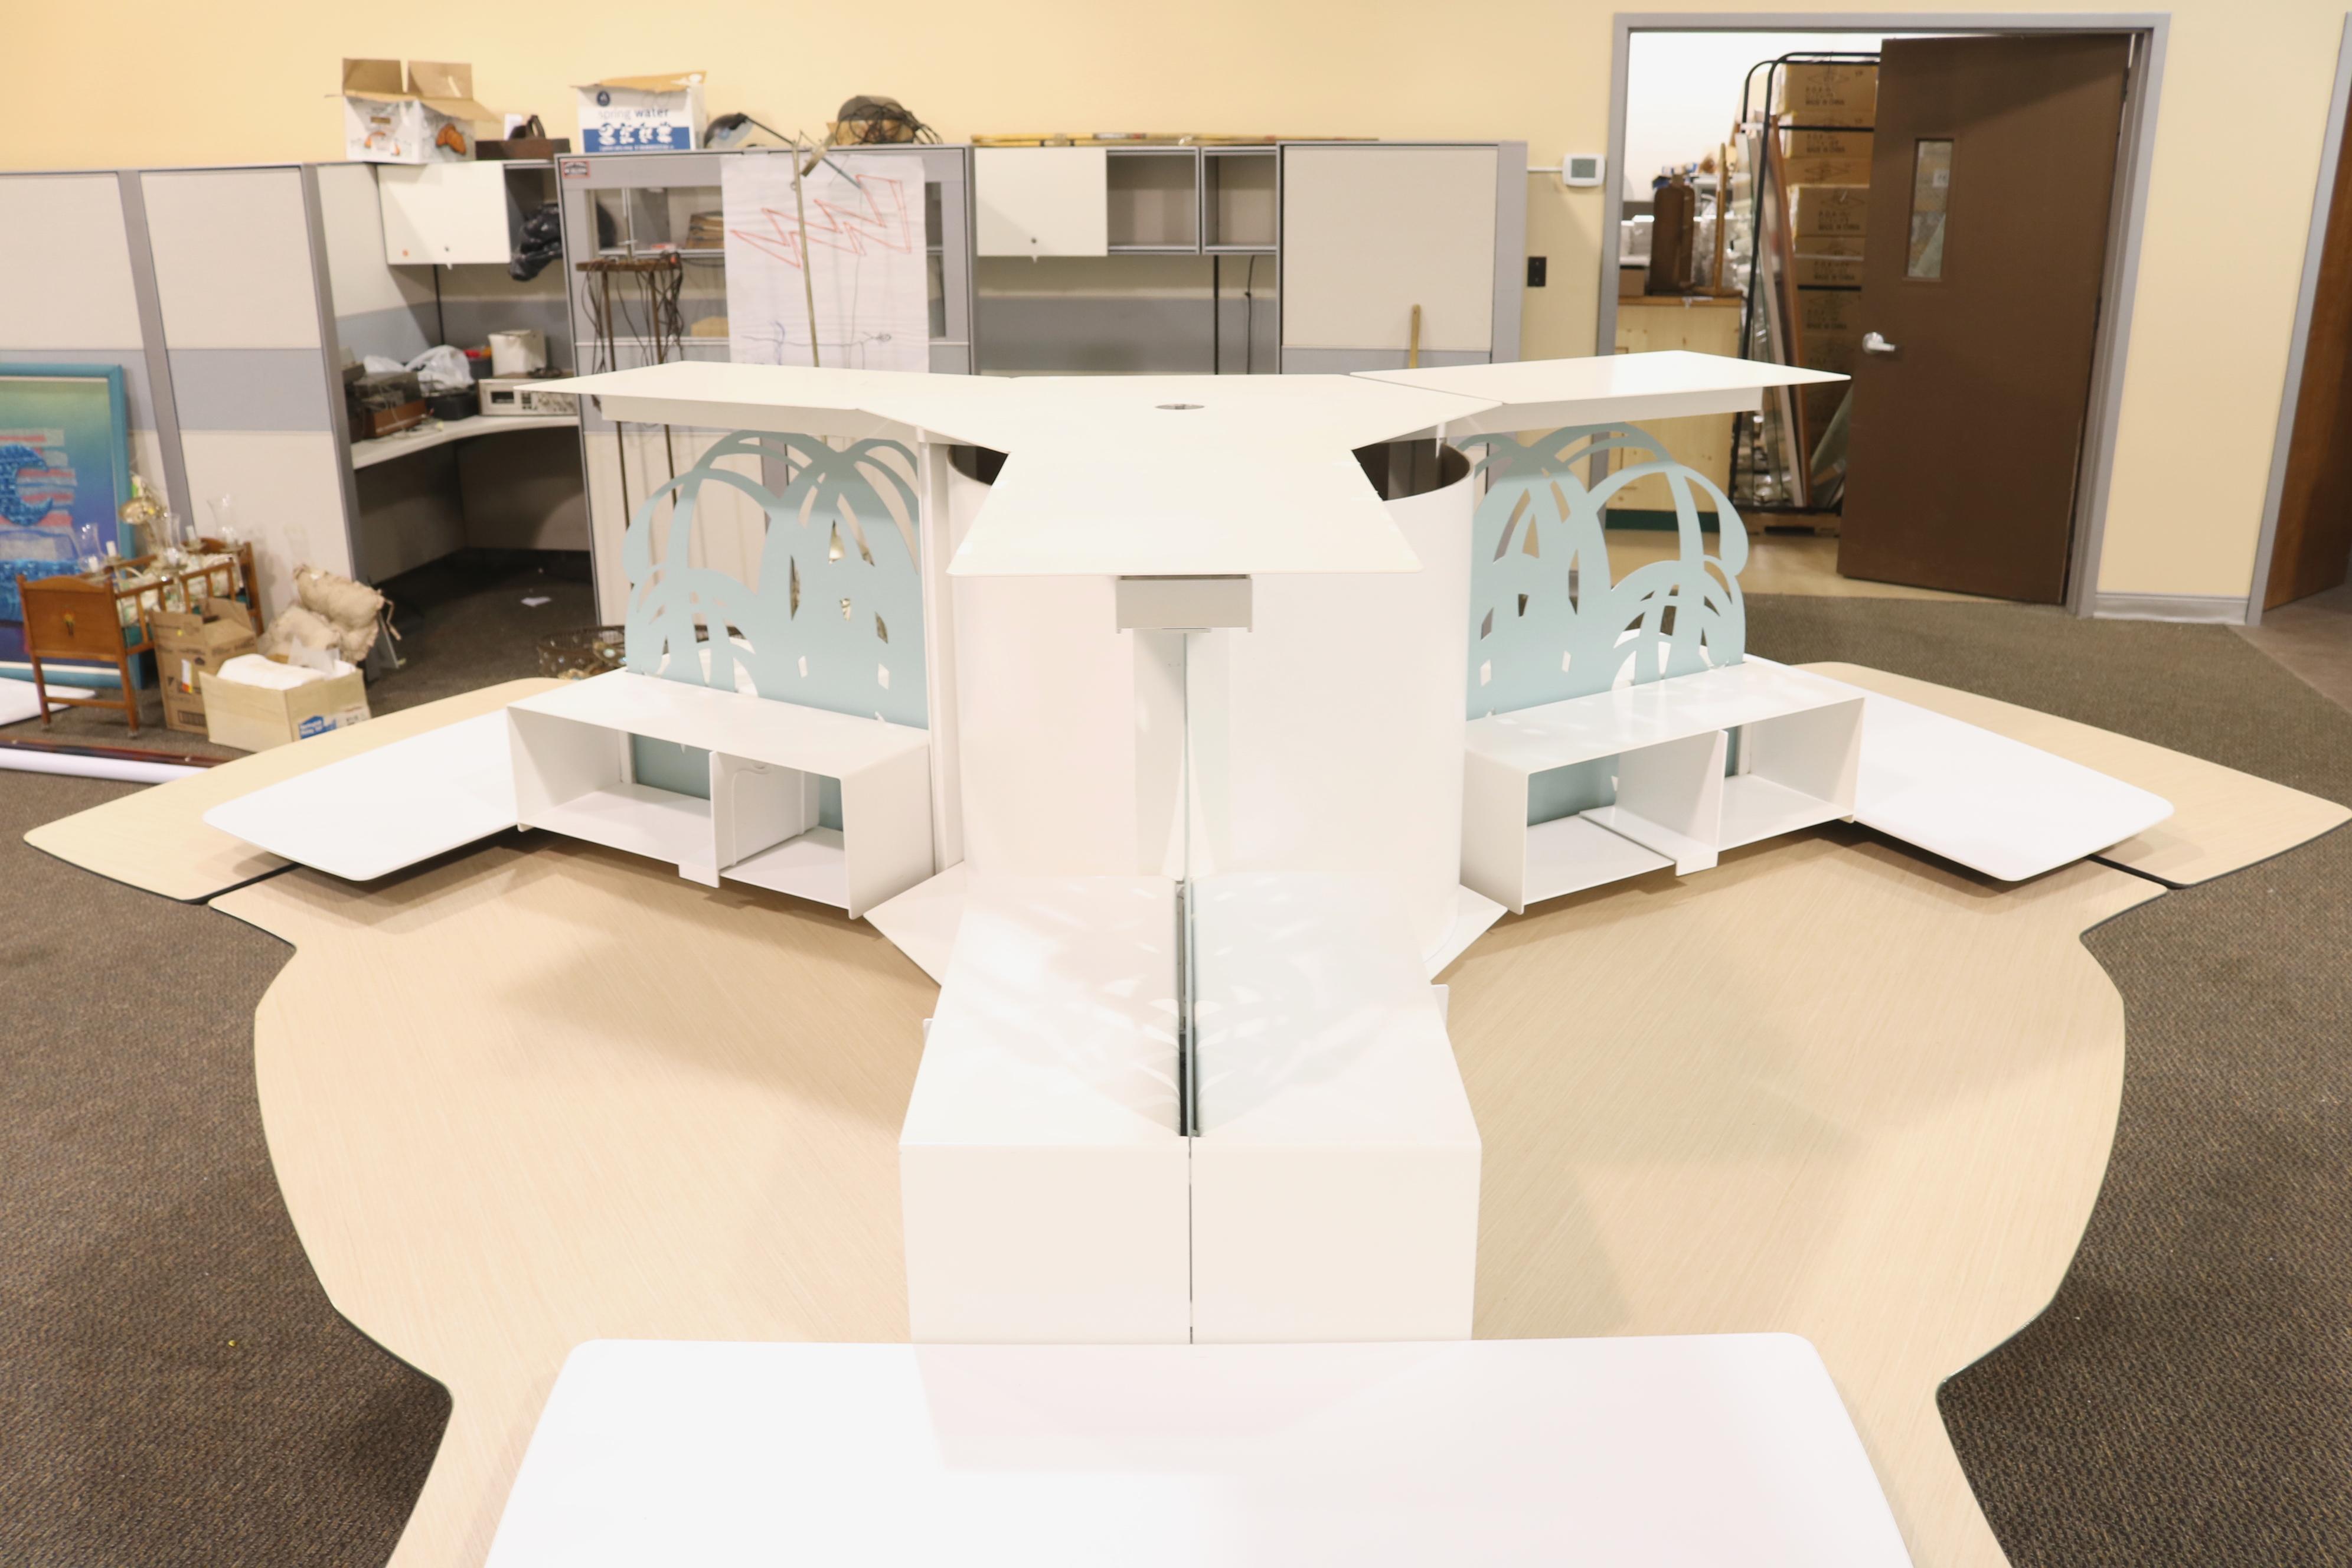 Kimball Bedroom Furniture Kimball Office Furniture 3 Person Workstation Morris Habitat For